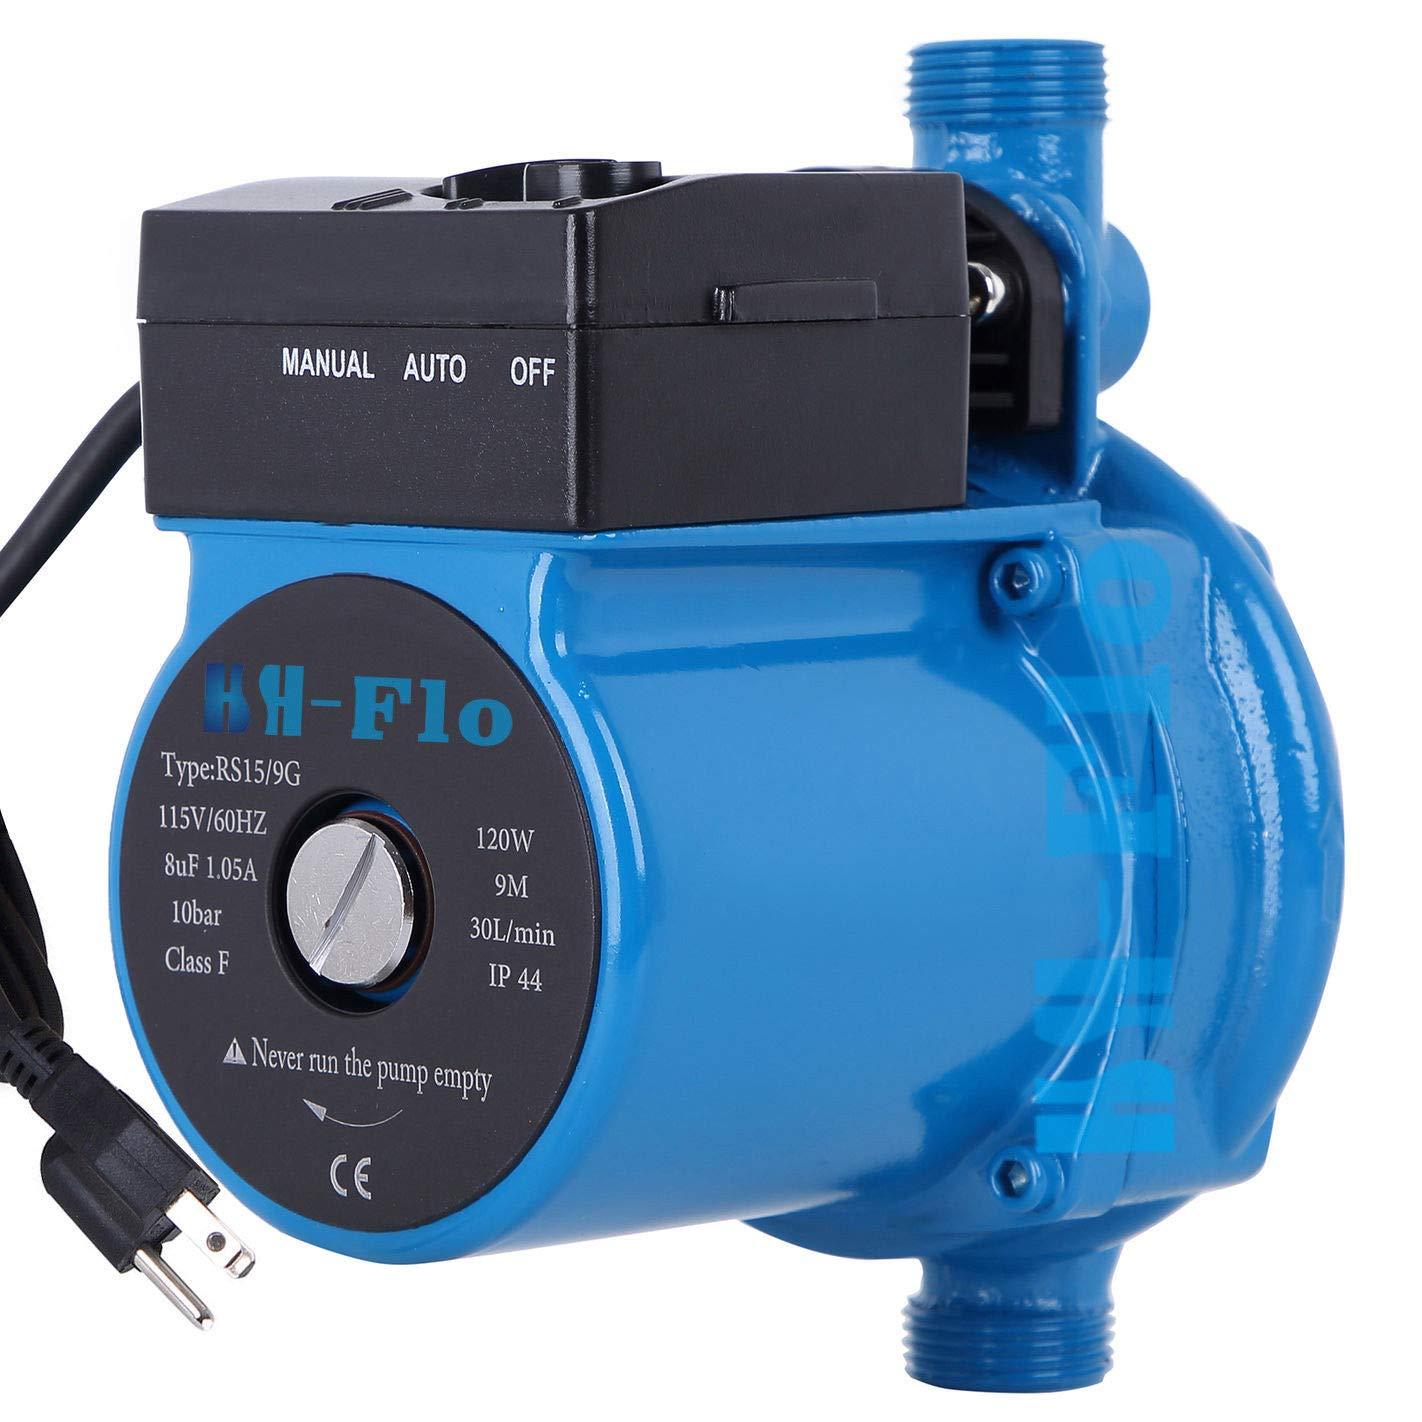 HSH-Flo 3/4'' 110V/120Vac 29Ft Head Circulator Pump Auto Hot Water Circulation Pump